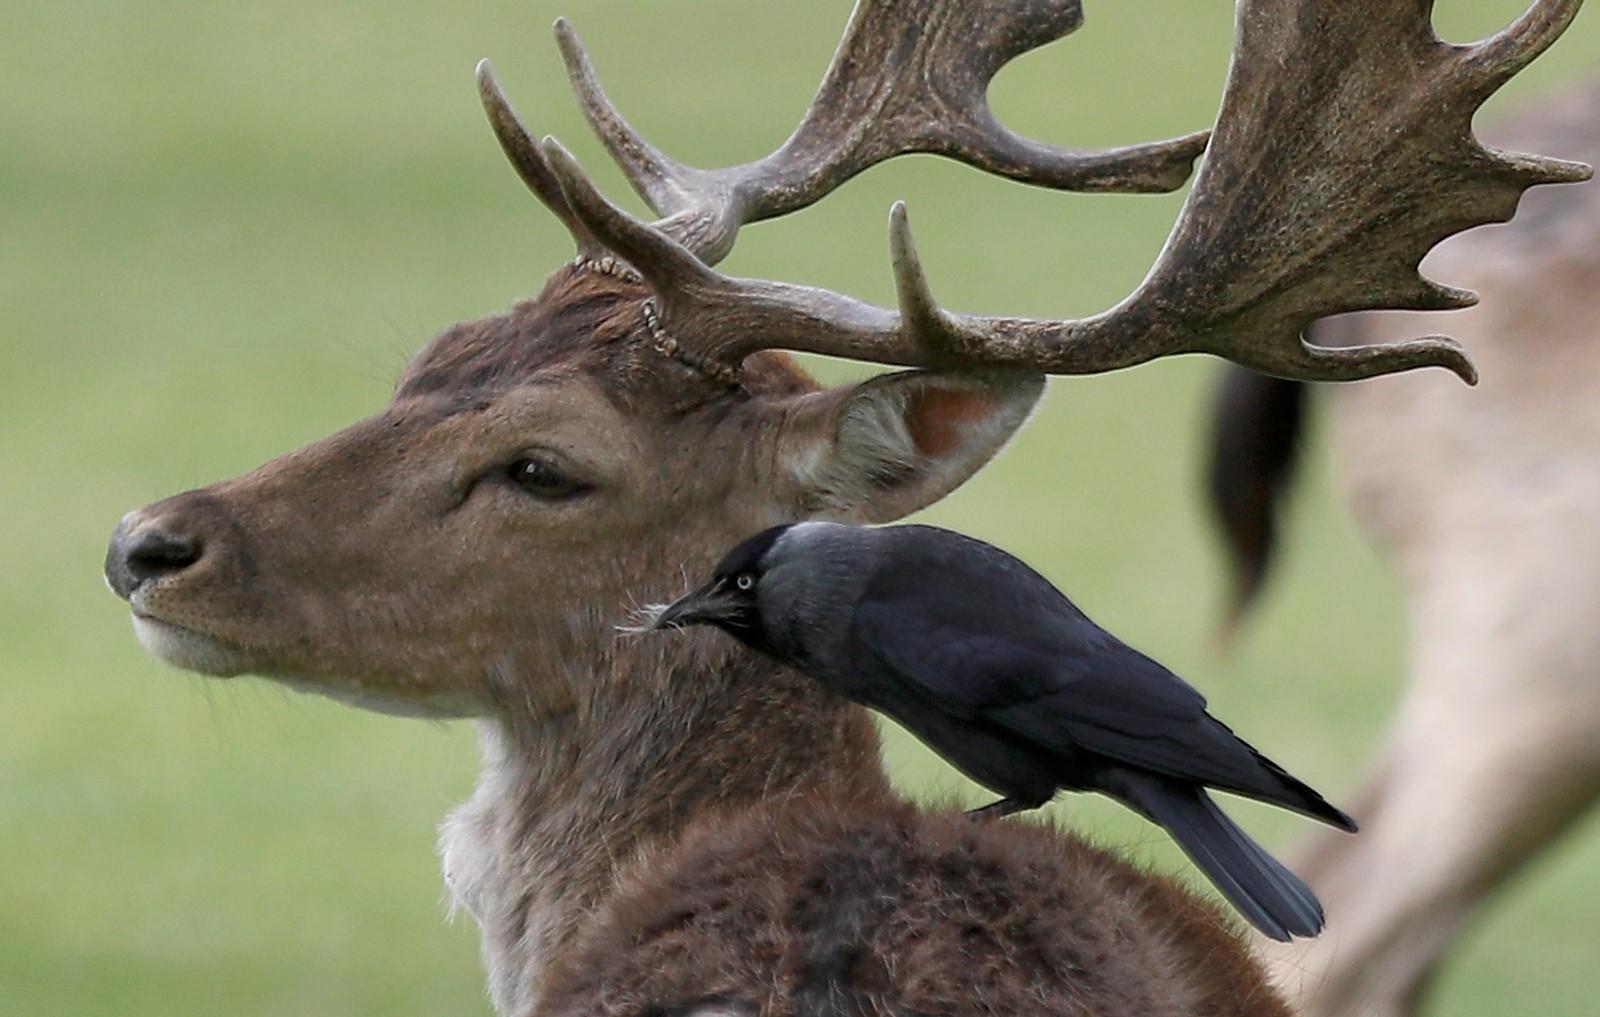 En fugl sitter på en hjort og funderer på tilværelsen i Bushby Park i London. Hva de ser på, sier nyhetsbyrået Reuters ingenting om.